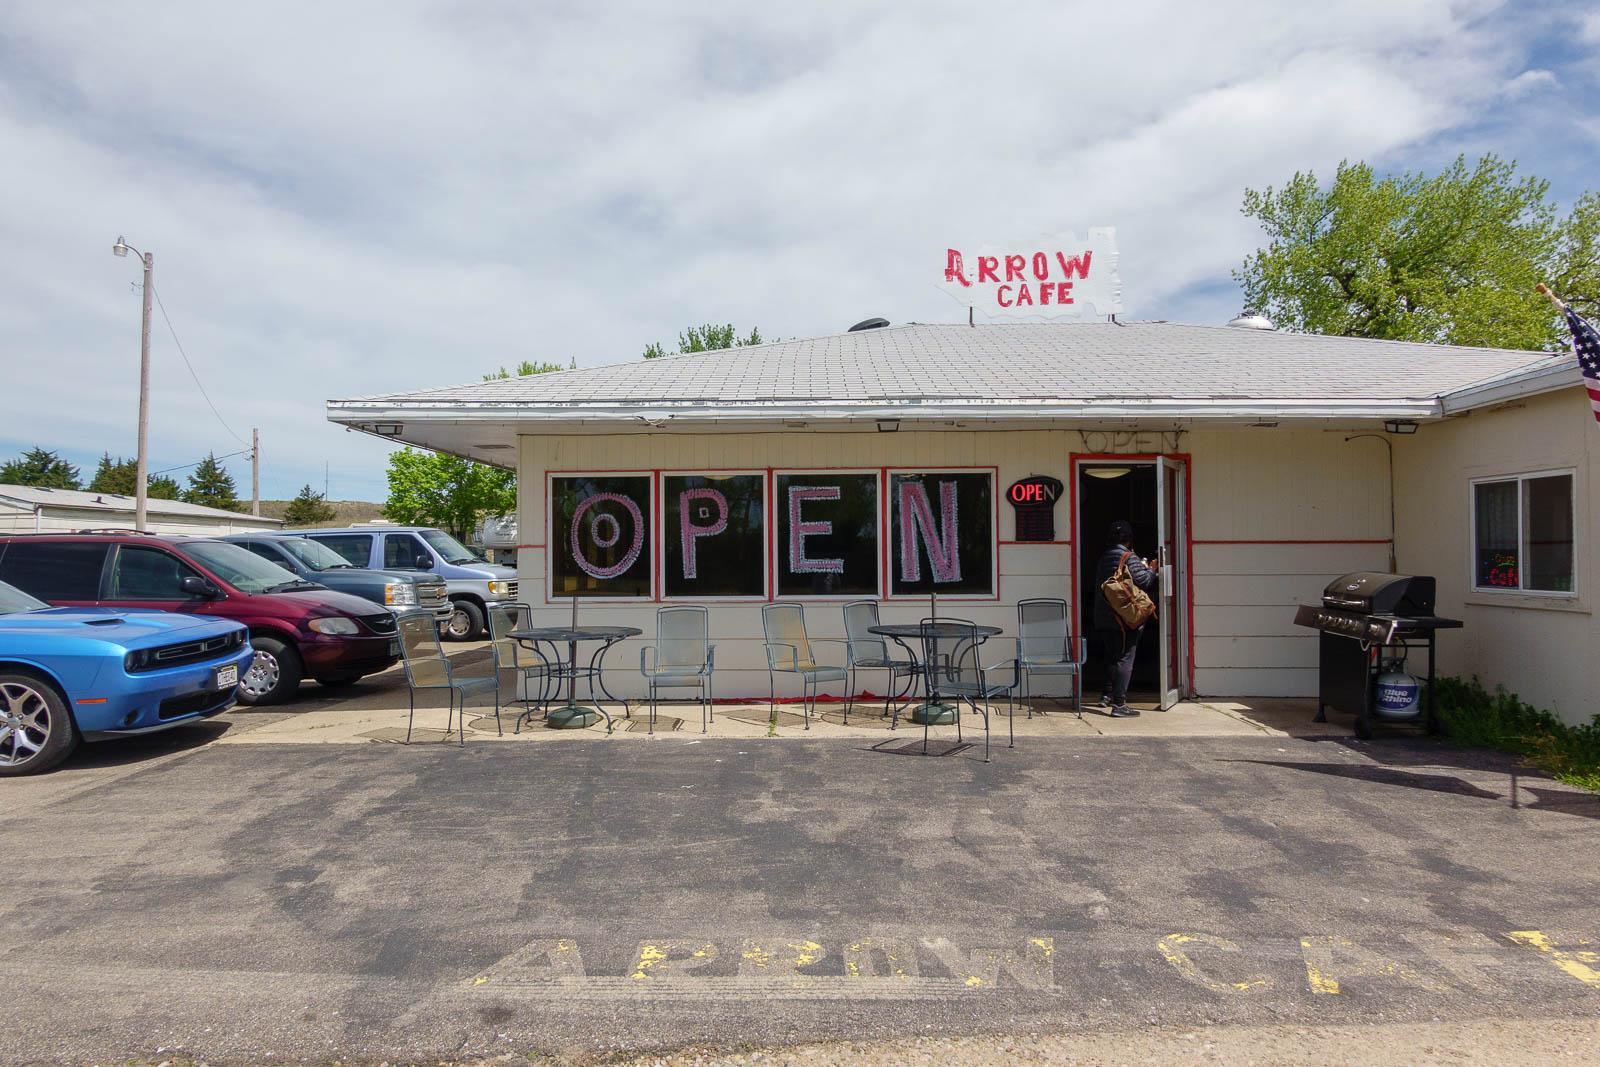 Arrow Cafe was open